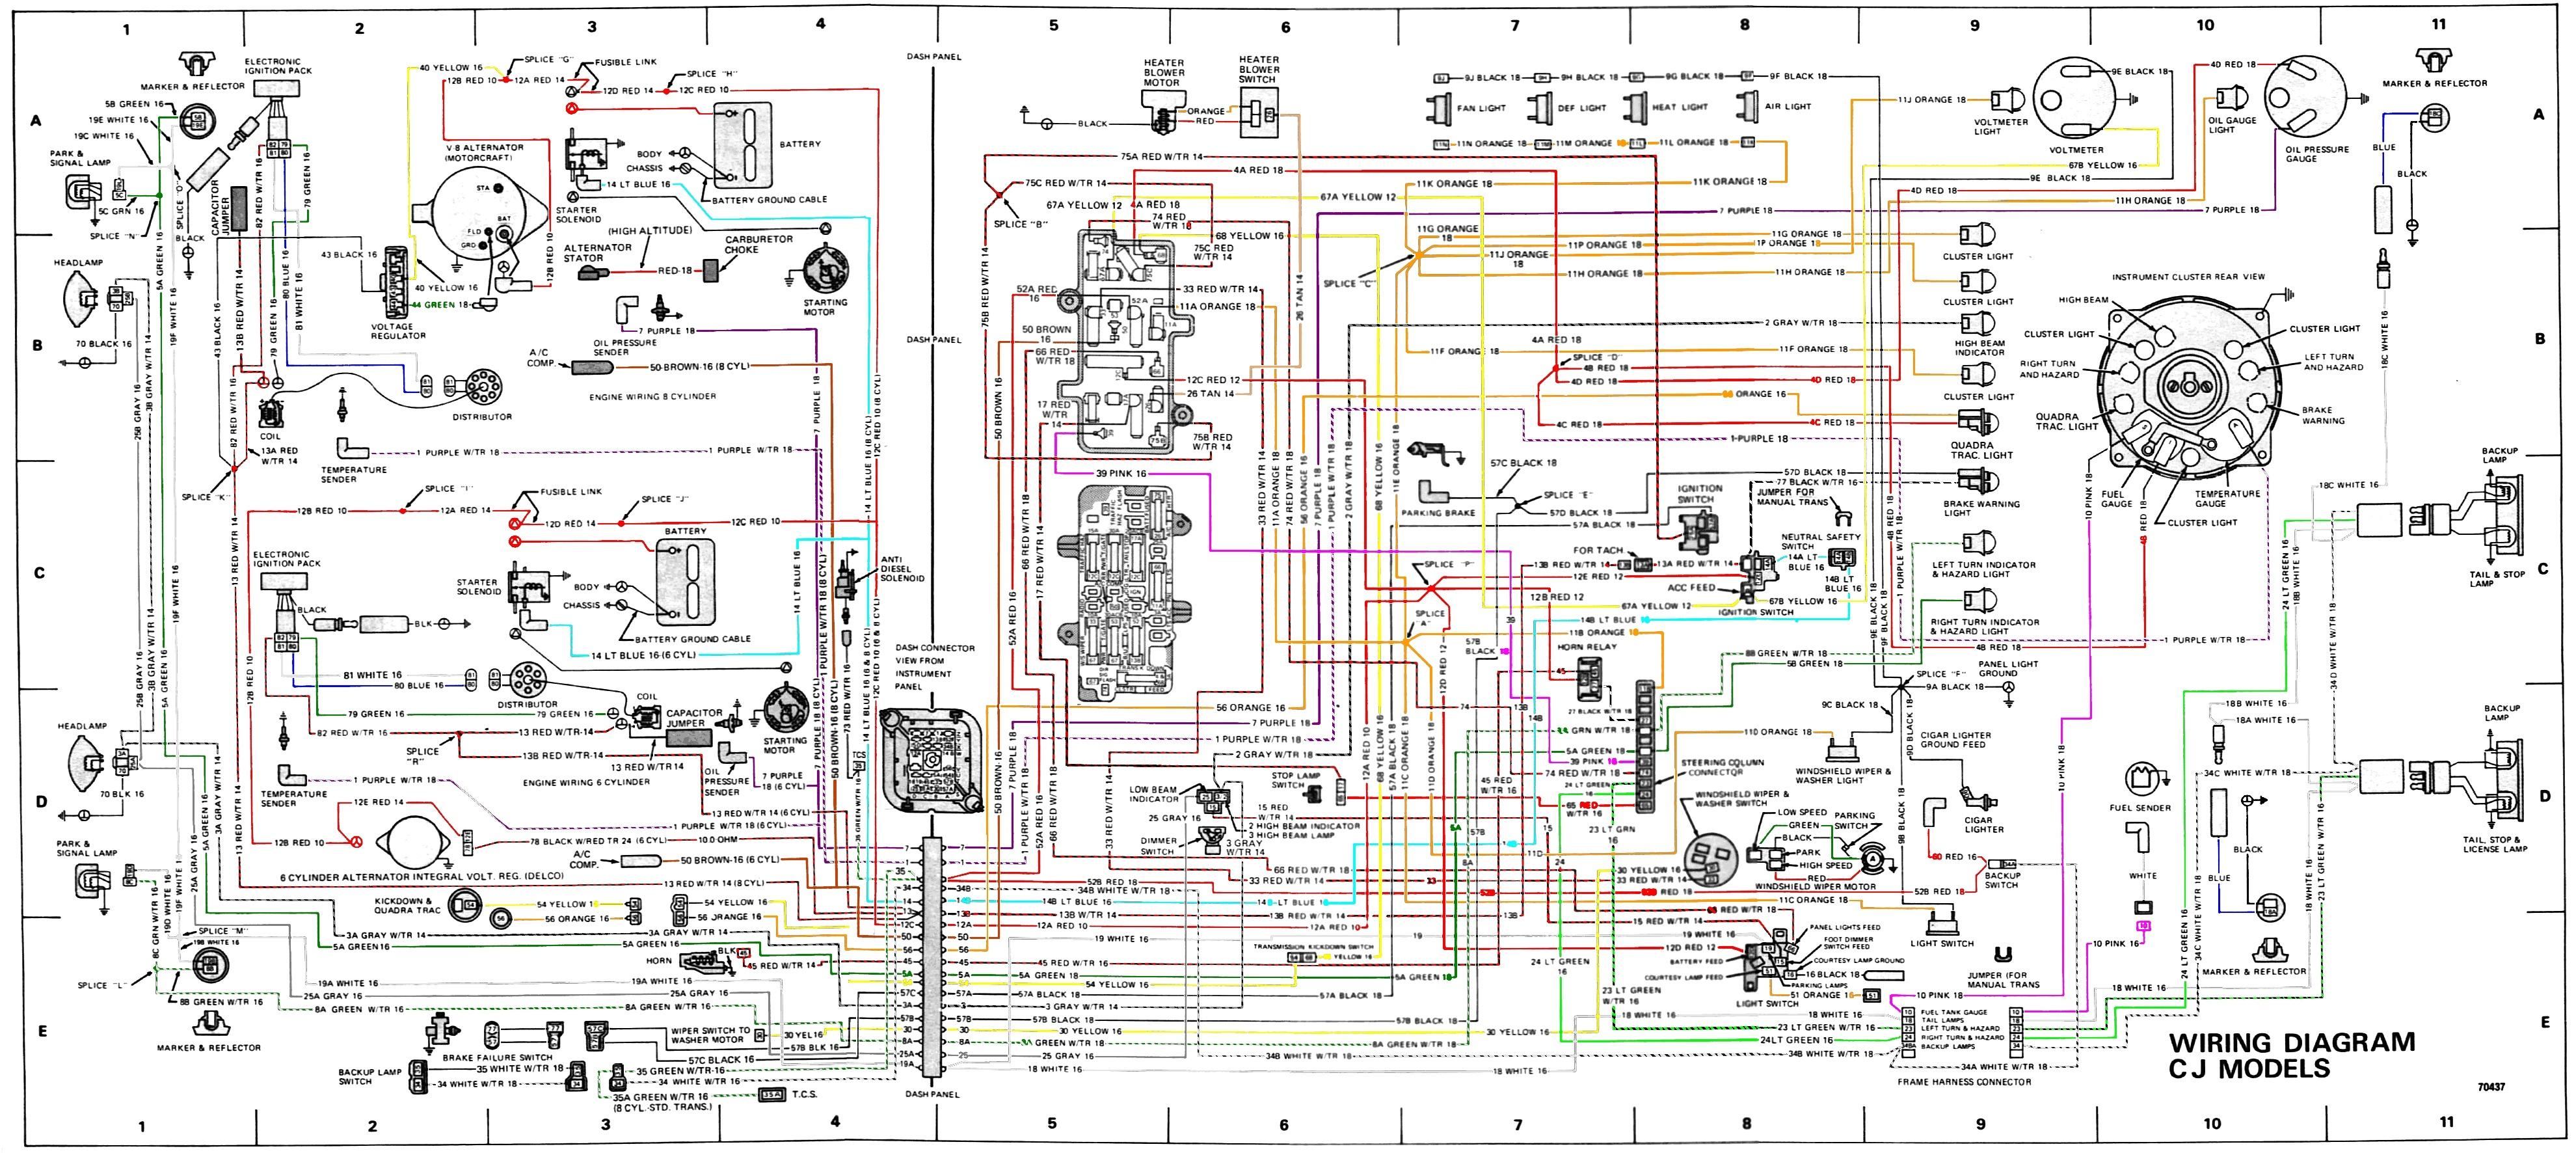 79 Cj Wiring Problems Jeepforum Com border=